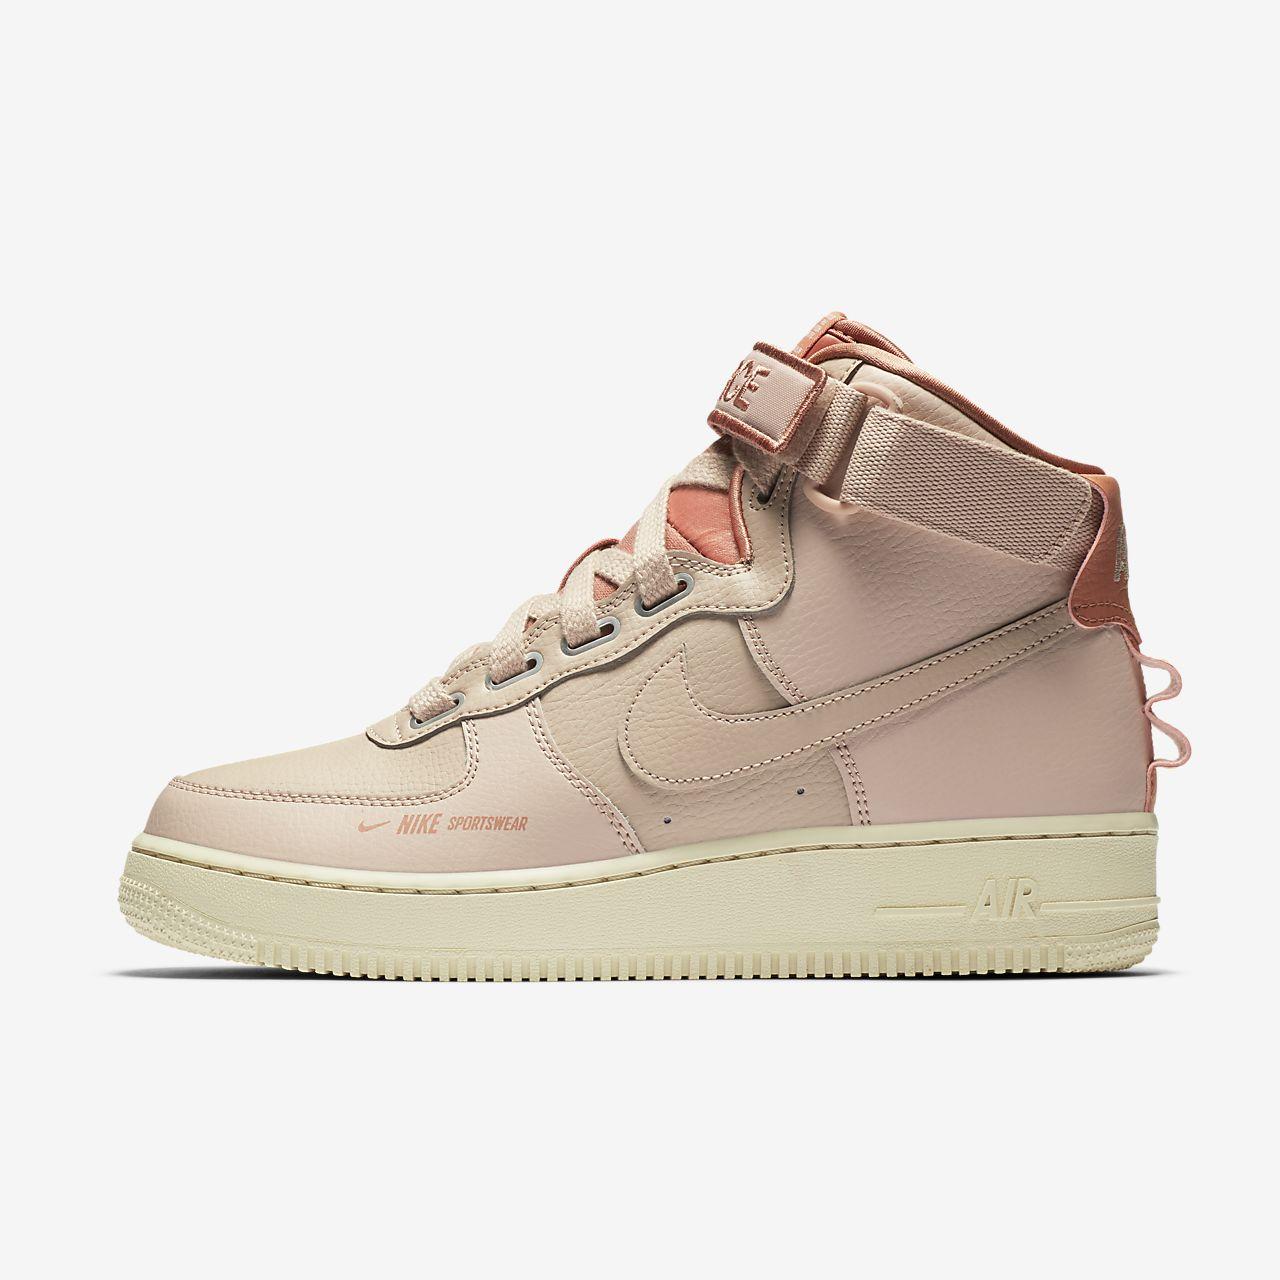 Nike Air Force 1 High Utility női cipő